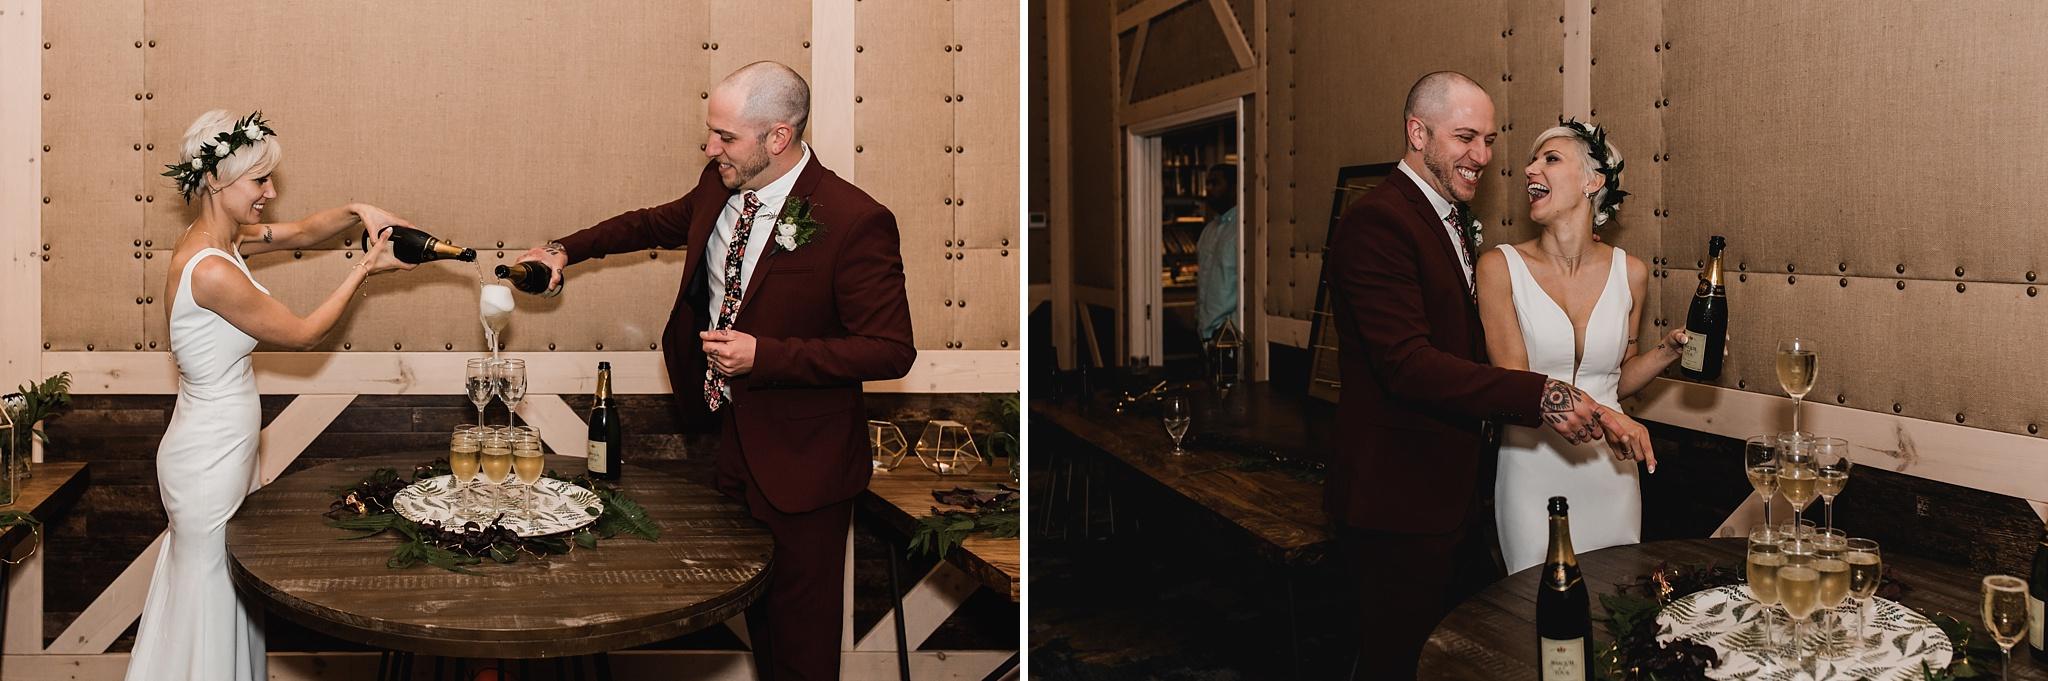 champagne tower wedding